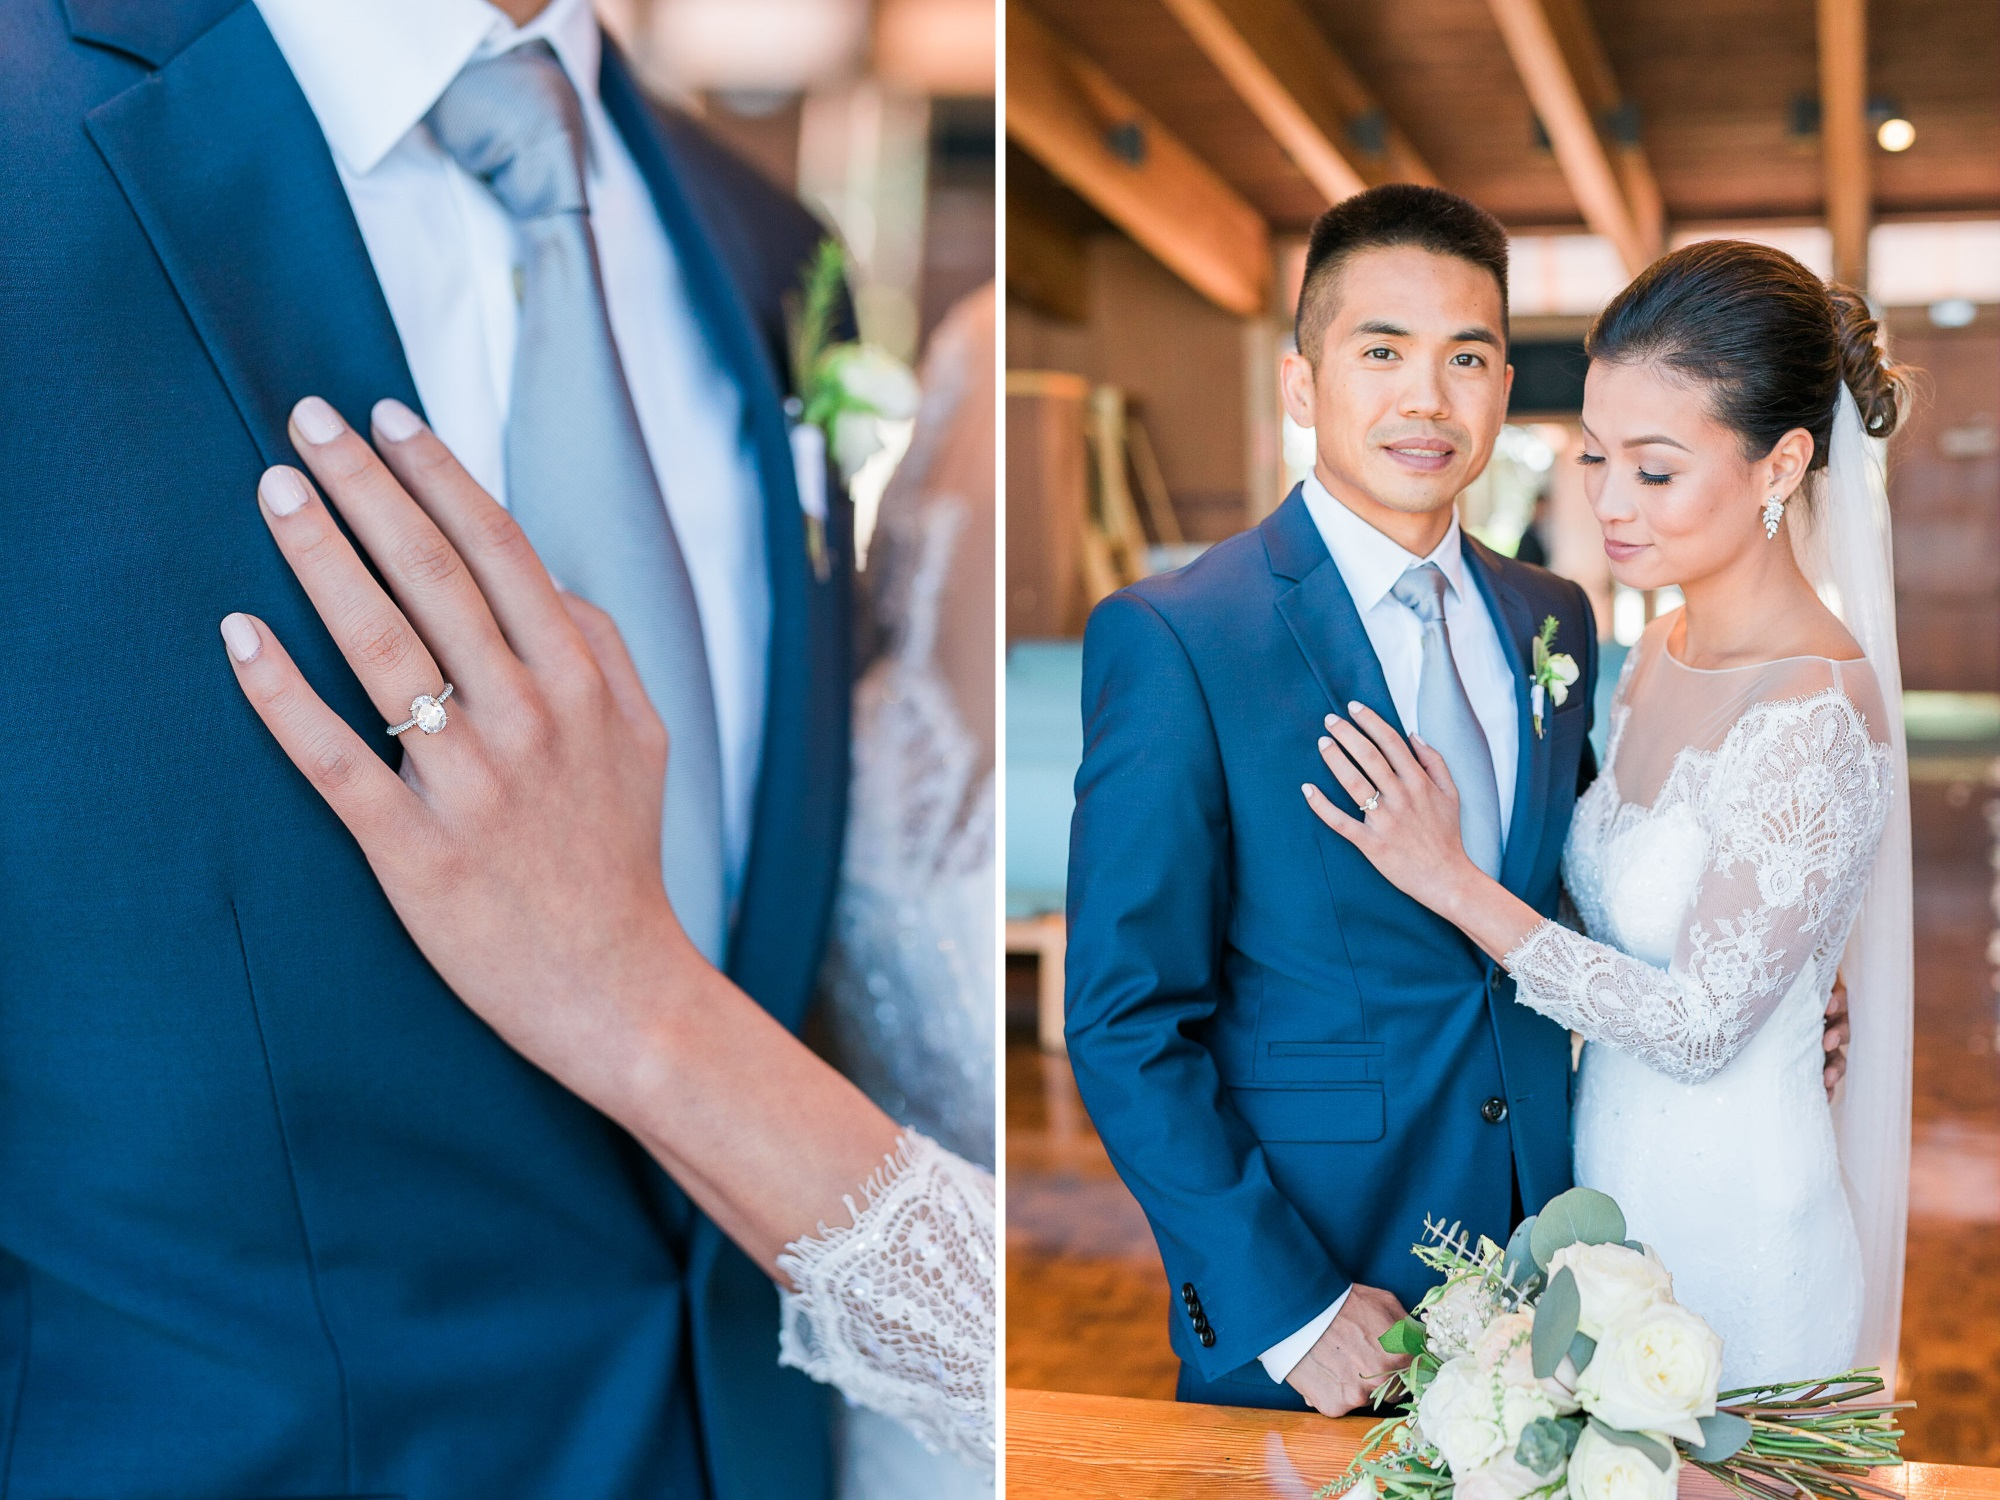 Wedding at Preservation Park in Oakland - Preservation Park Wedding Photos by JBJ Pictures San Francisco Photographer (36).jpg